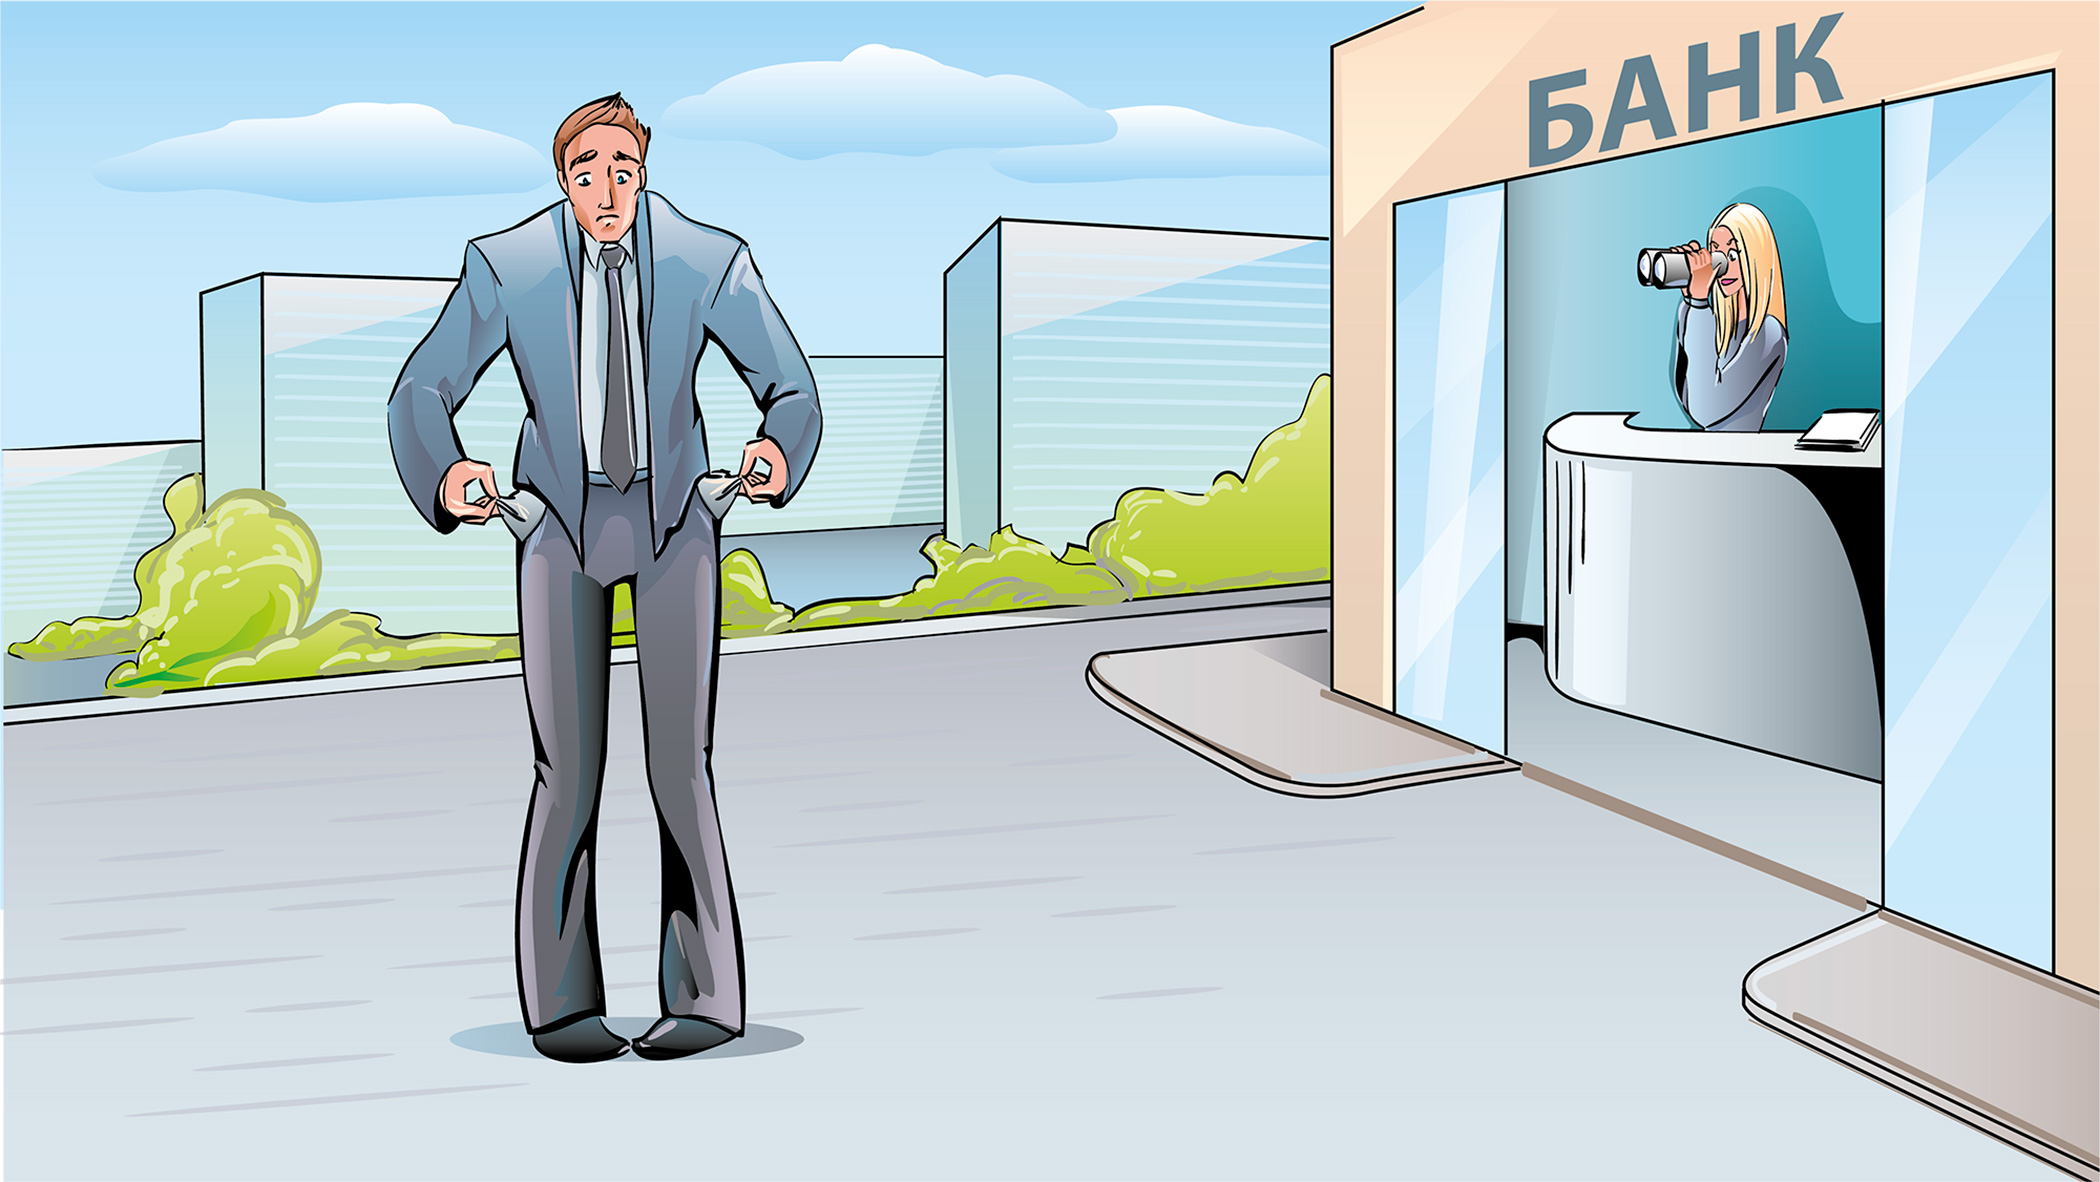 Долговая яма, долг банку